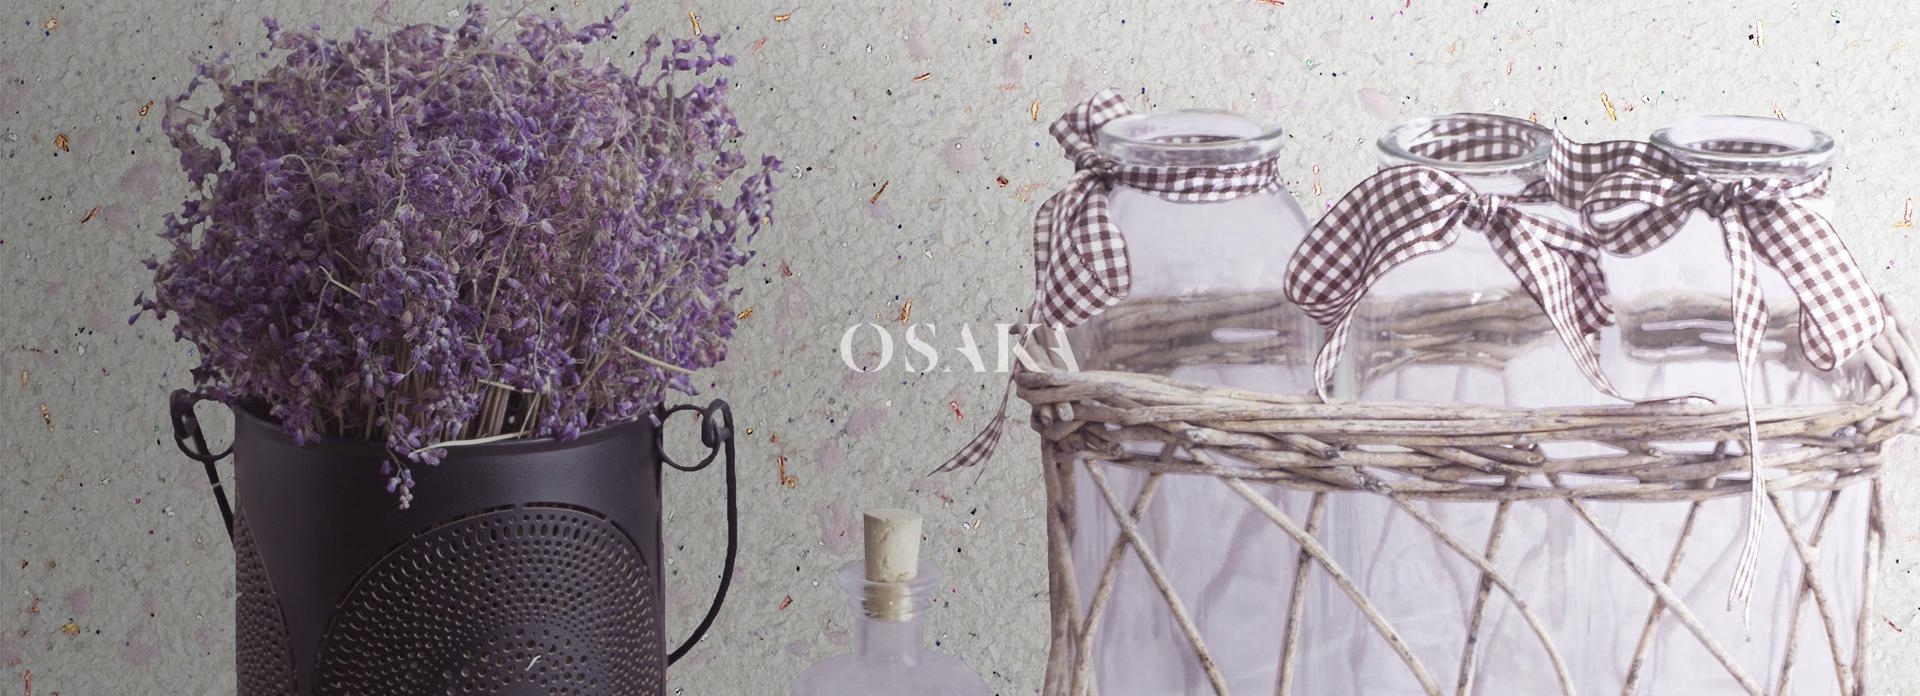 pintura-decorativaosaka-textil-japonés-2